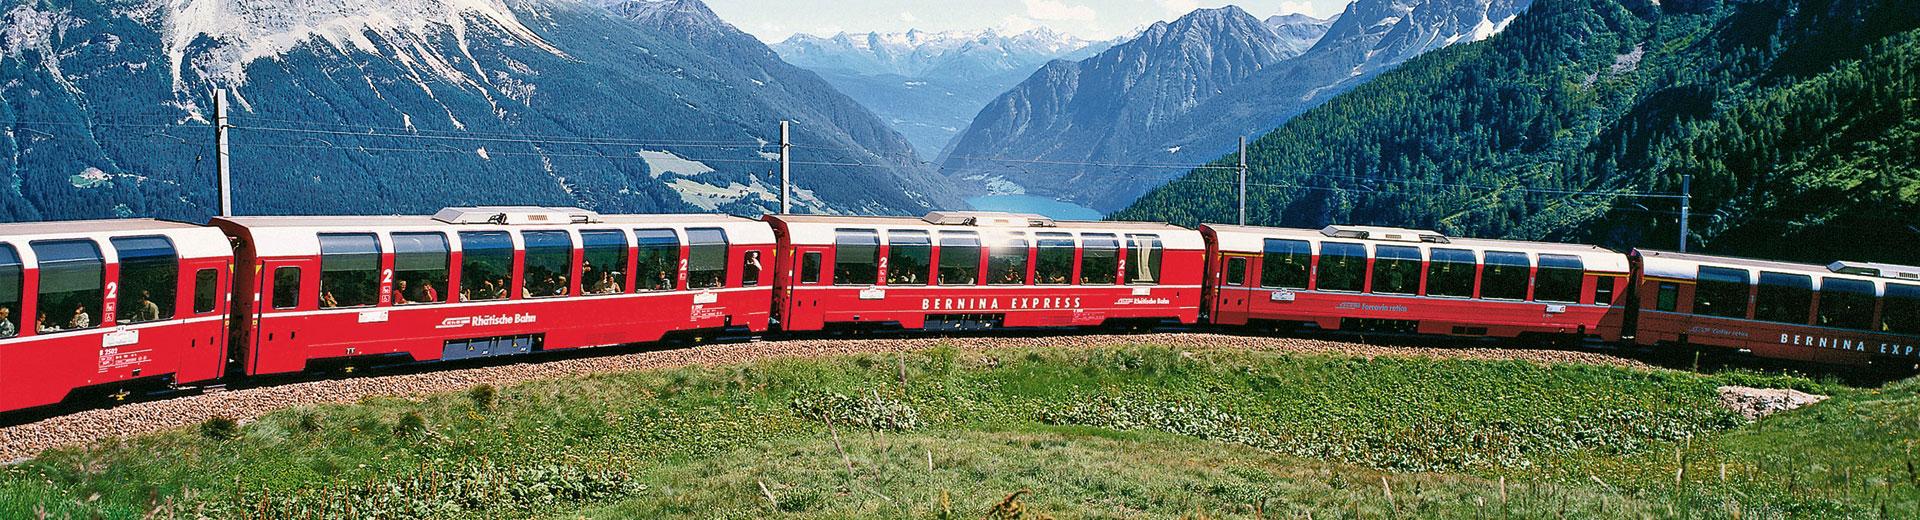 Bernina Express – 1re classe offerte au prix de la 2e classe